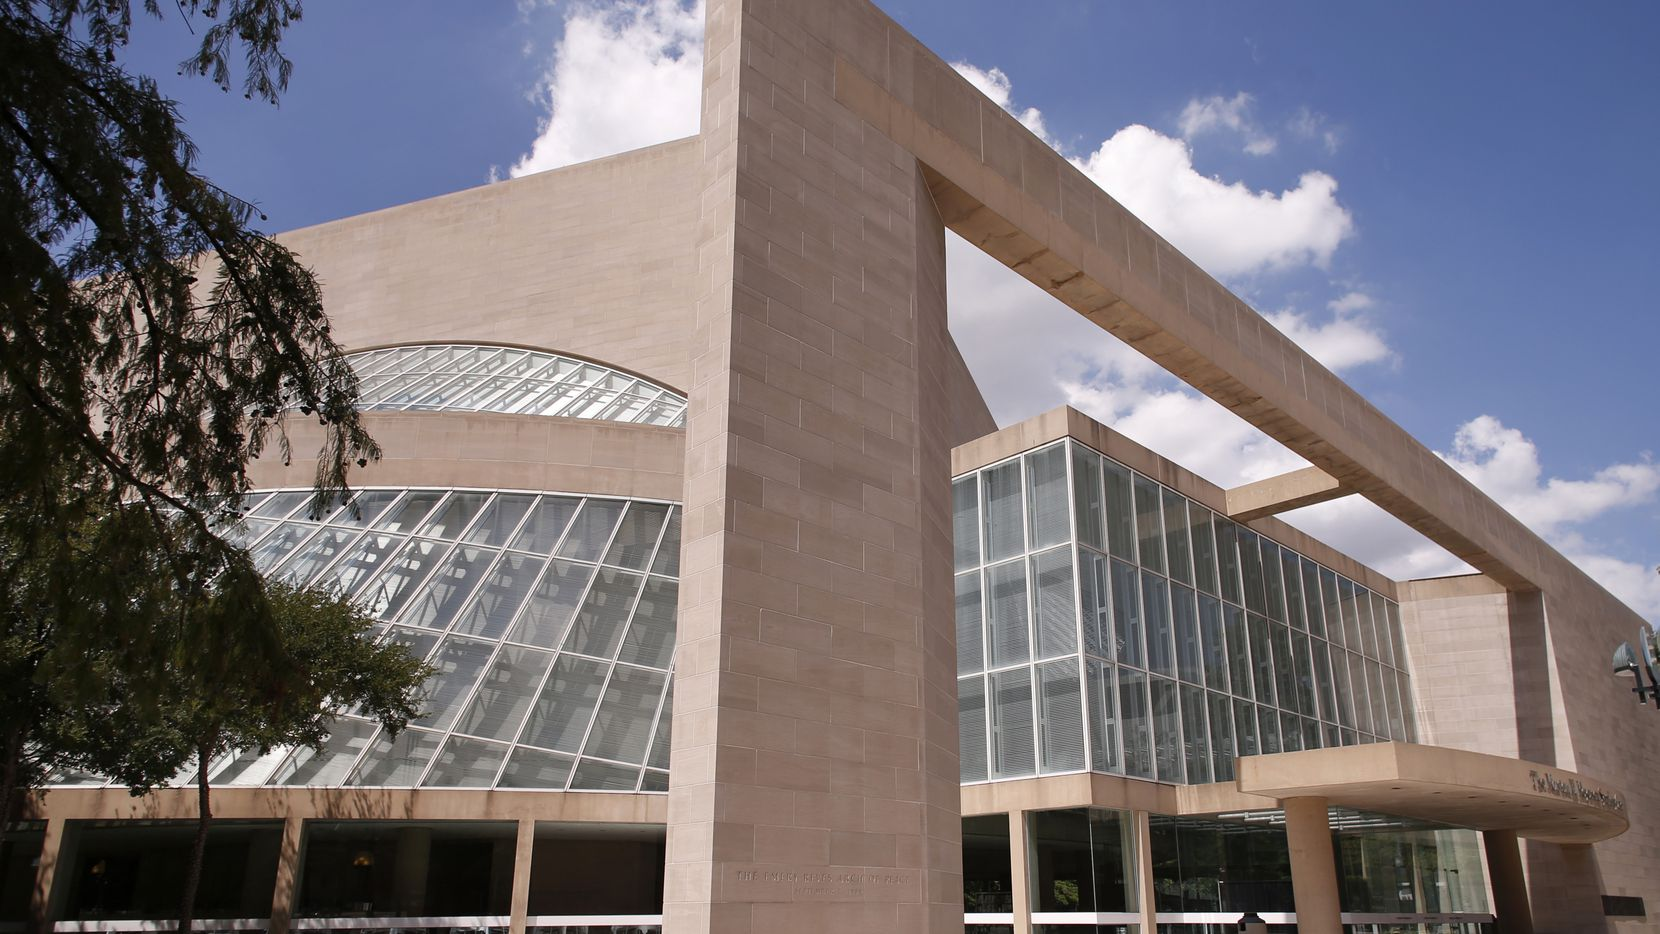 The Morton H. Meyerson Symphony Center is a big, bombastic crowd-pleaser designed by architect I.M. Pei.